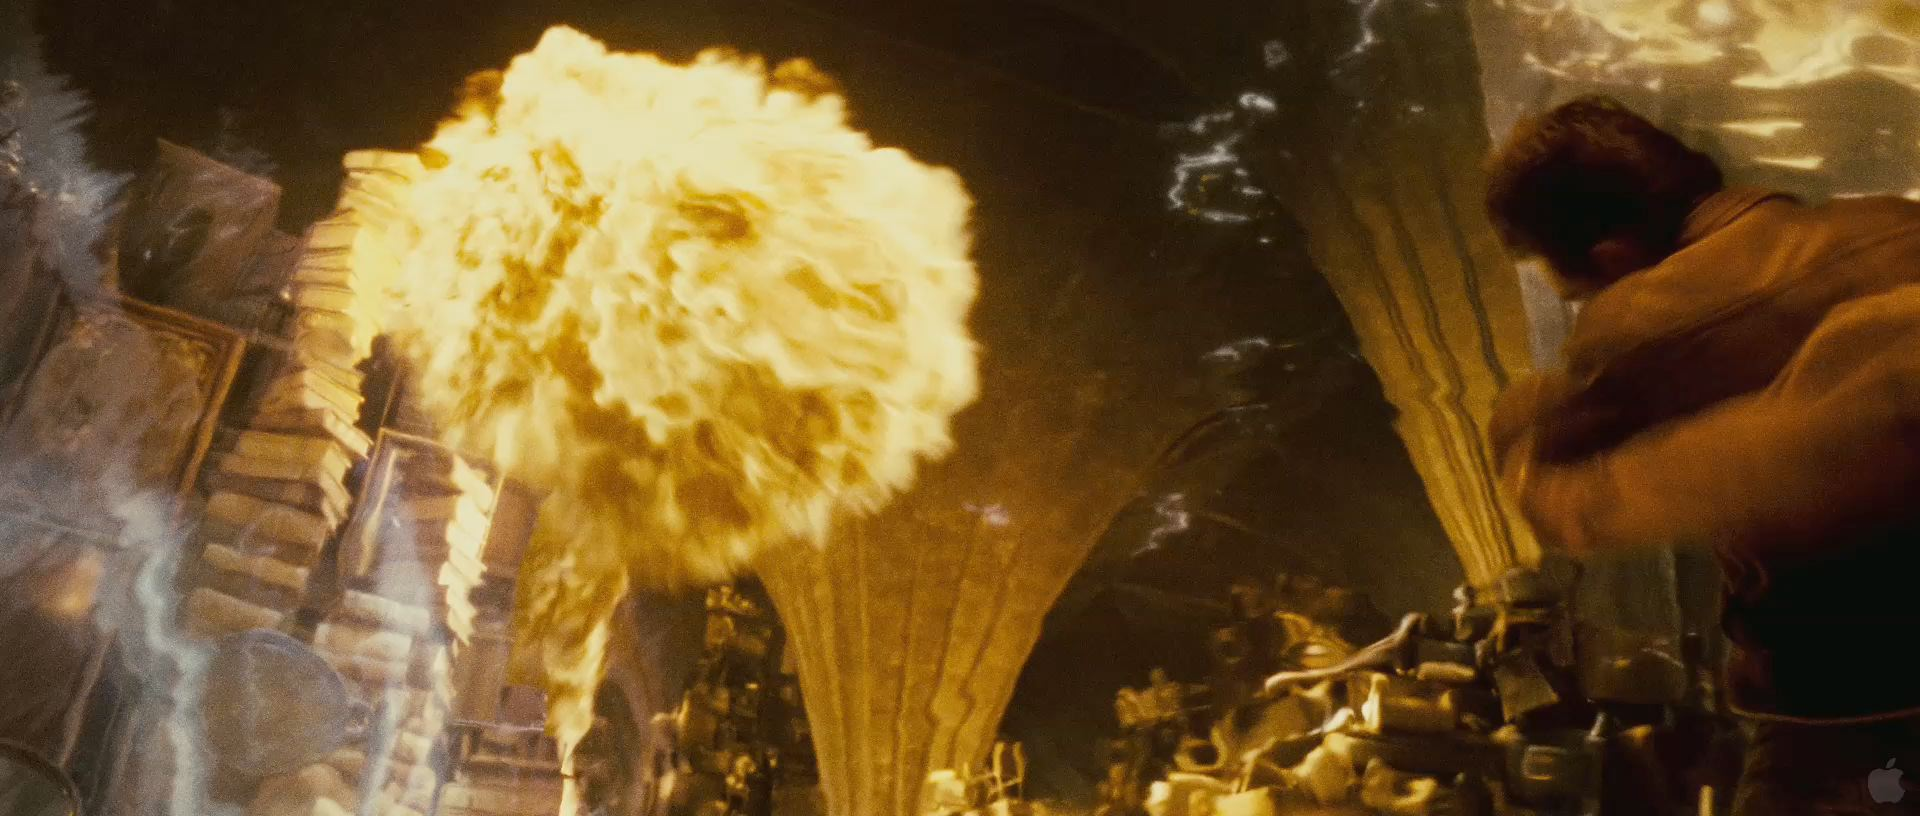 Harry Potter BlogHogwarts HP7 2 Trailer 71